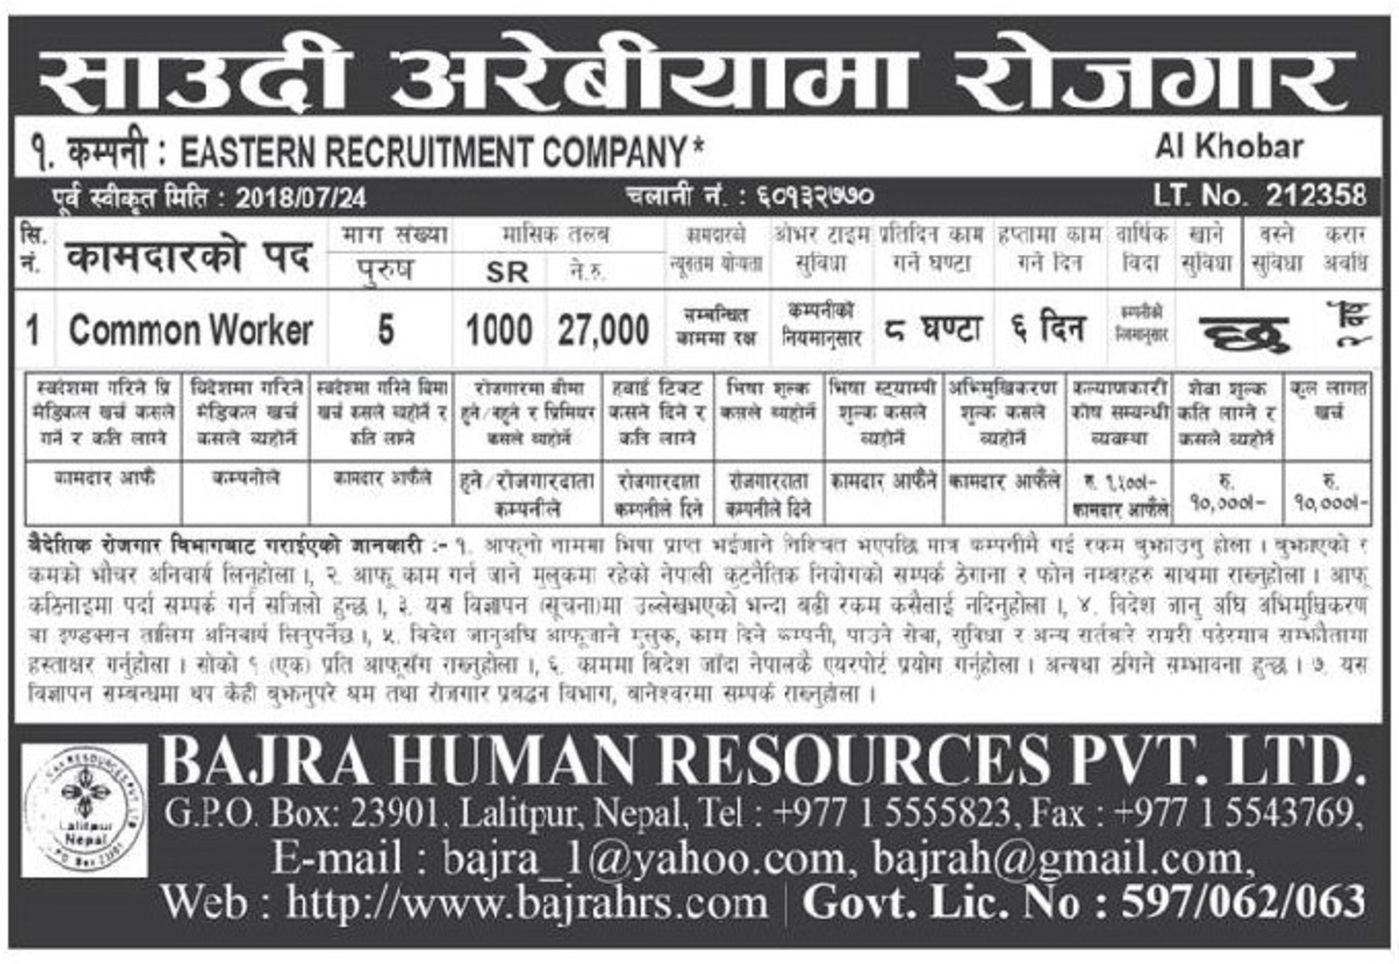 Jobs Nepal - Vacancy - Common Worker - Al Khobar - ( International